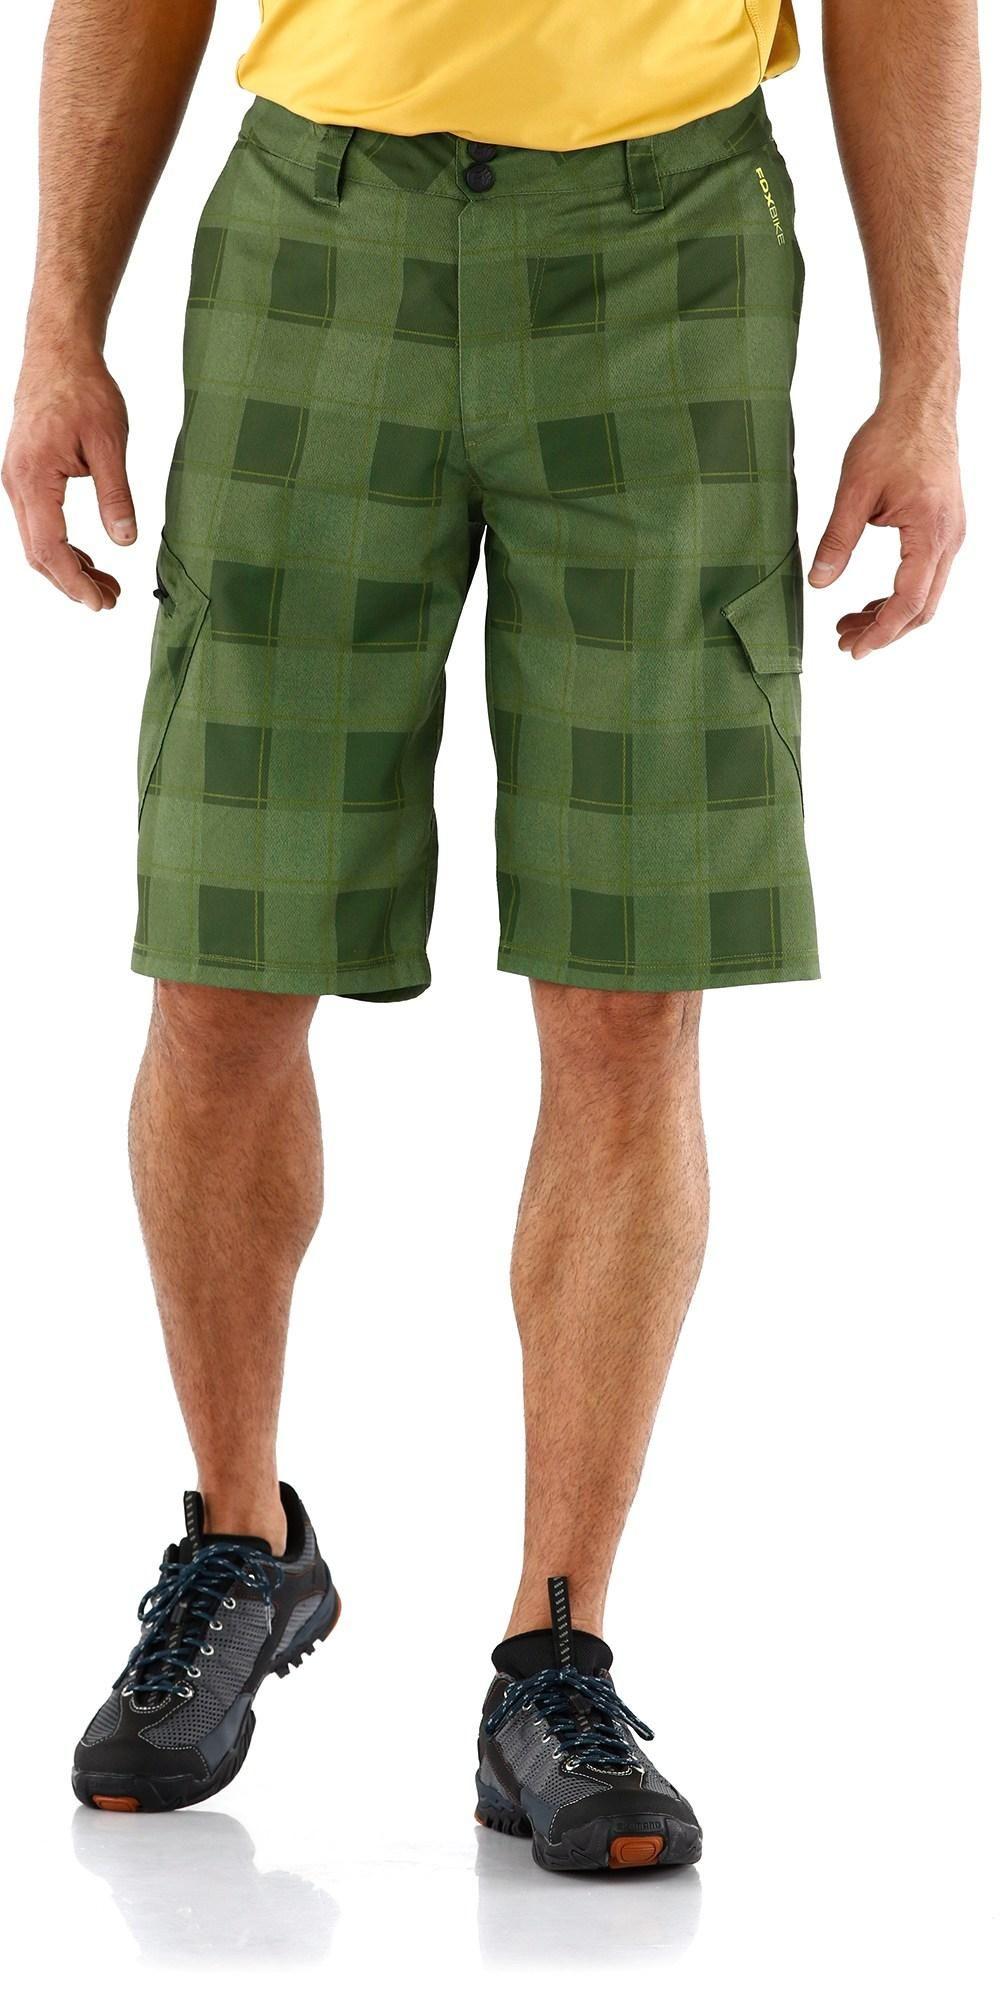 The Men S Fox Ranger Print Cargo Mountain Bike Shorts Have Liner